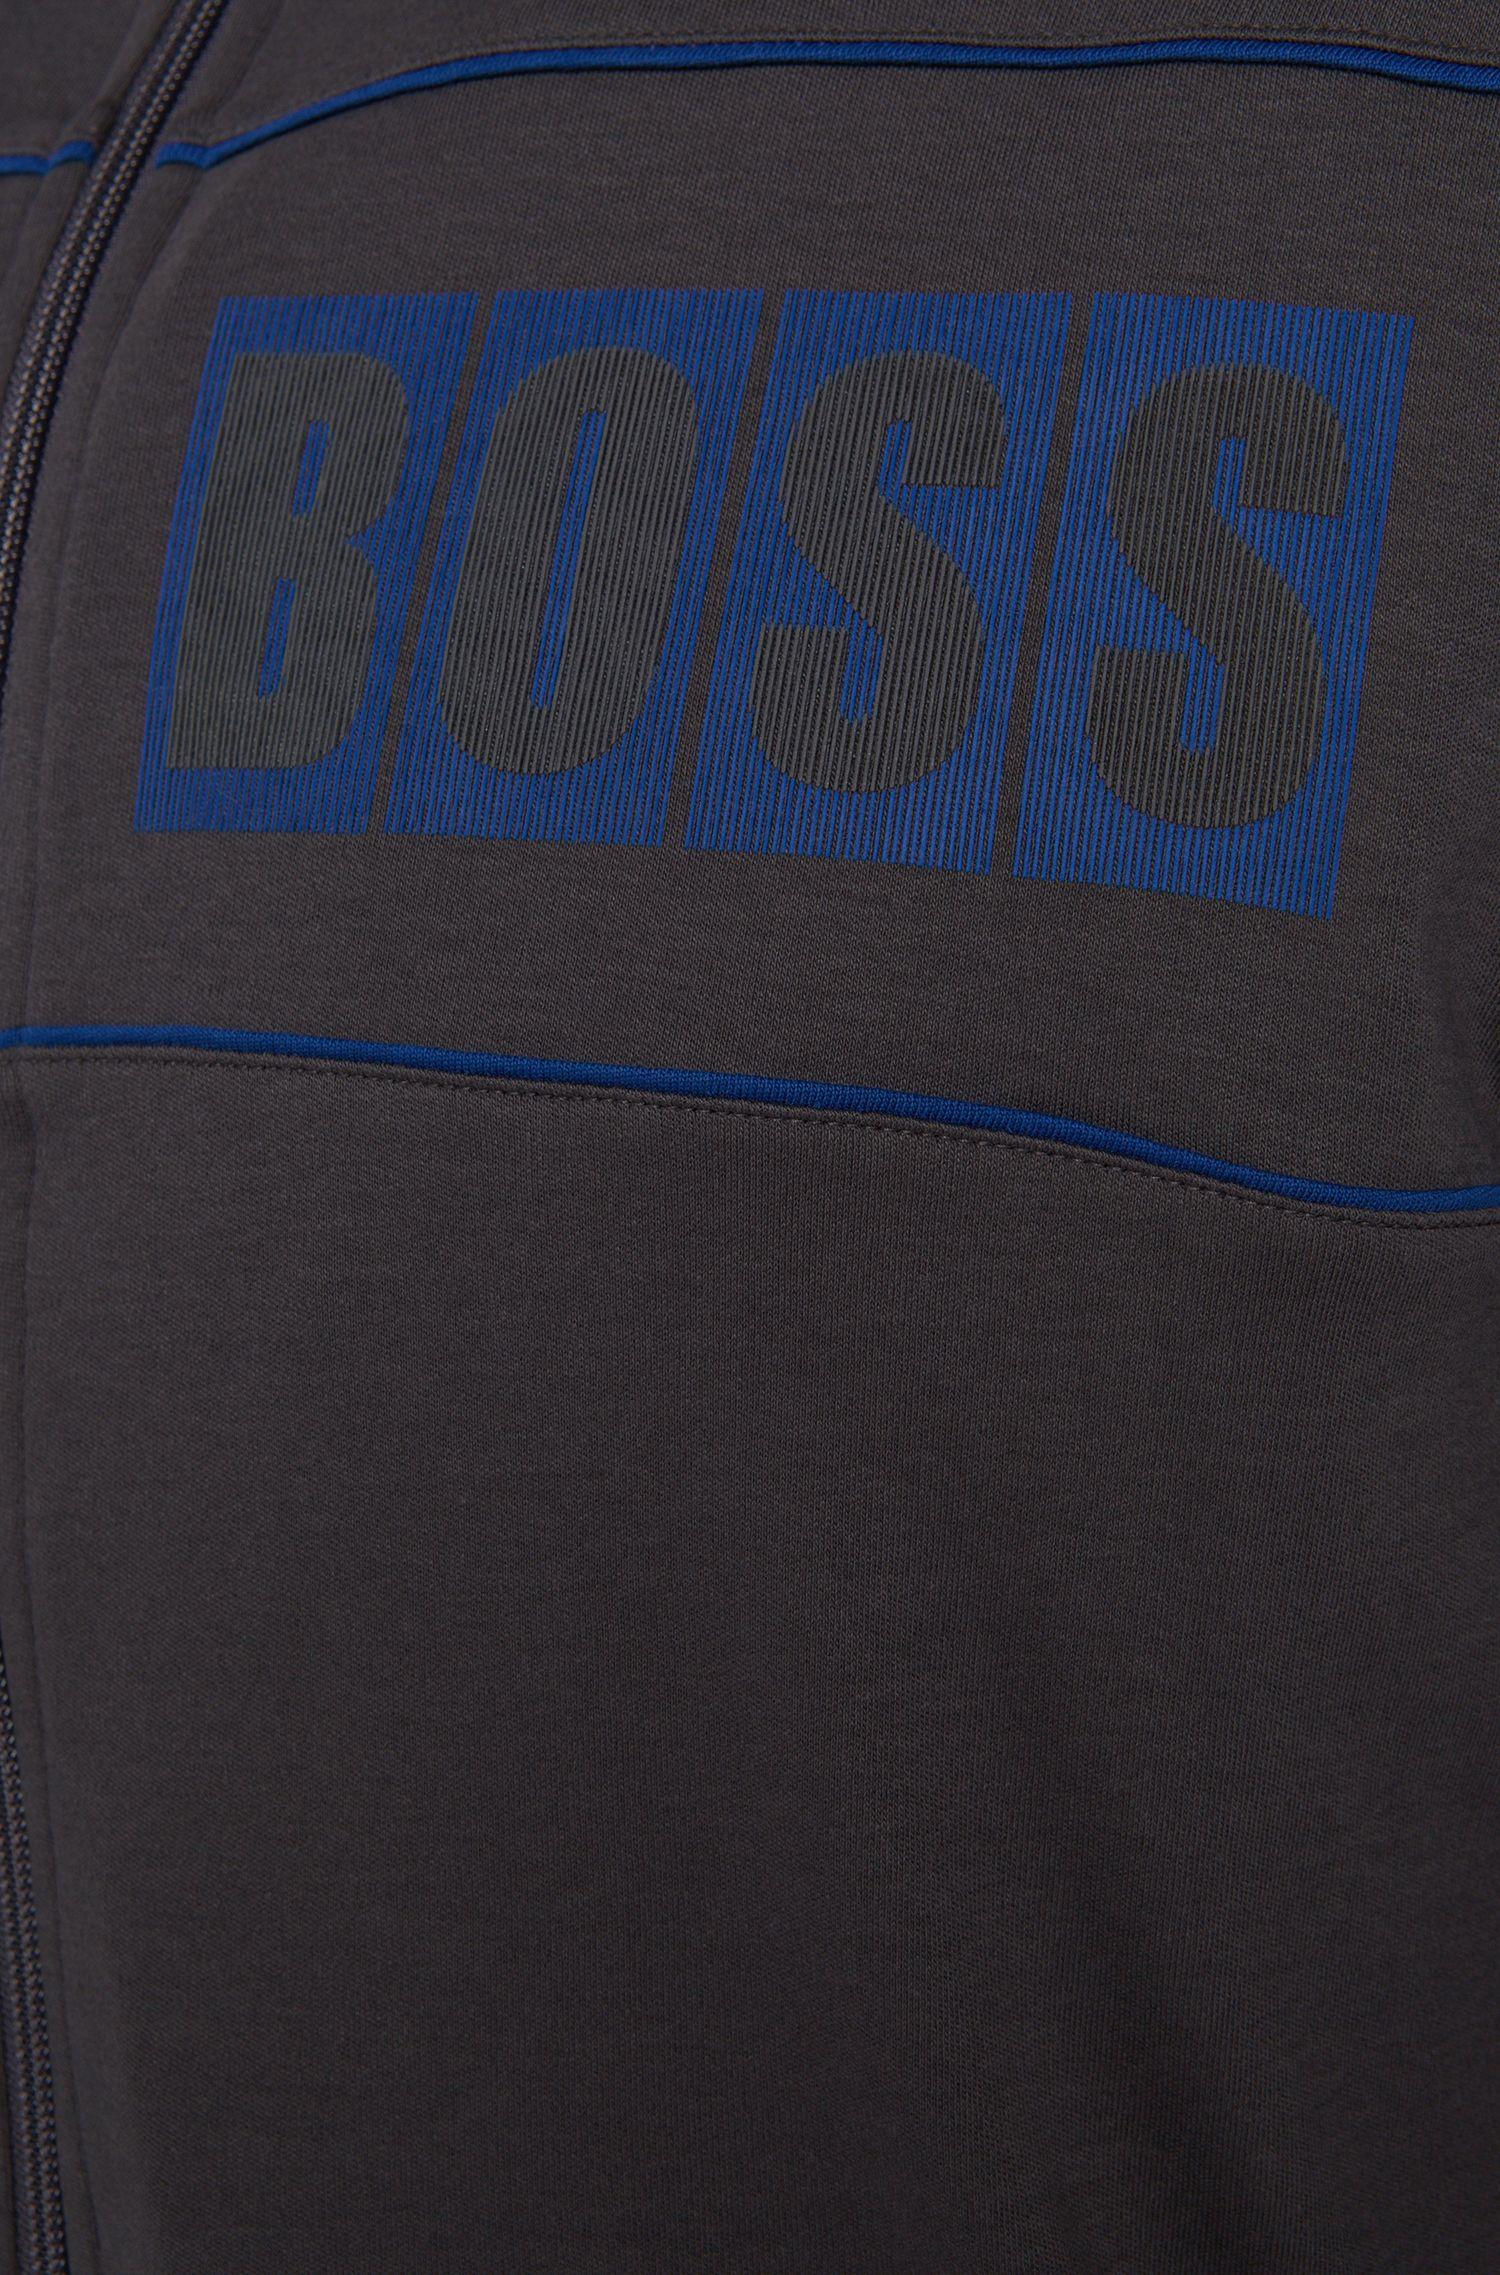 Sweatshirt-Jacke aus Baumwolle mit Kapuze: 'Jacket Hooded'